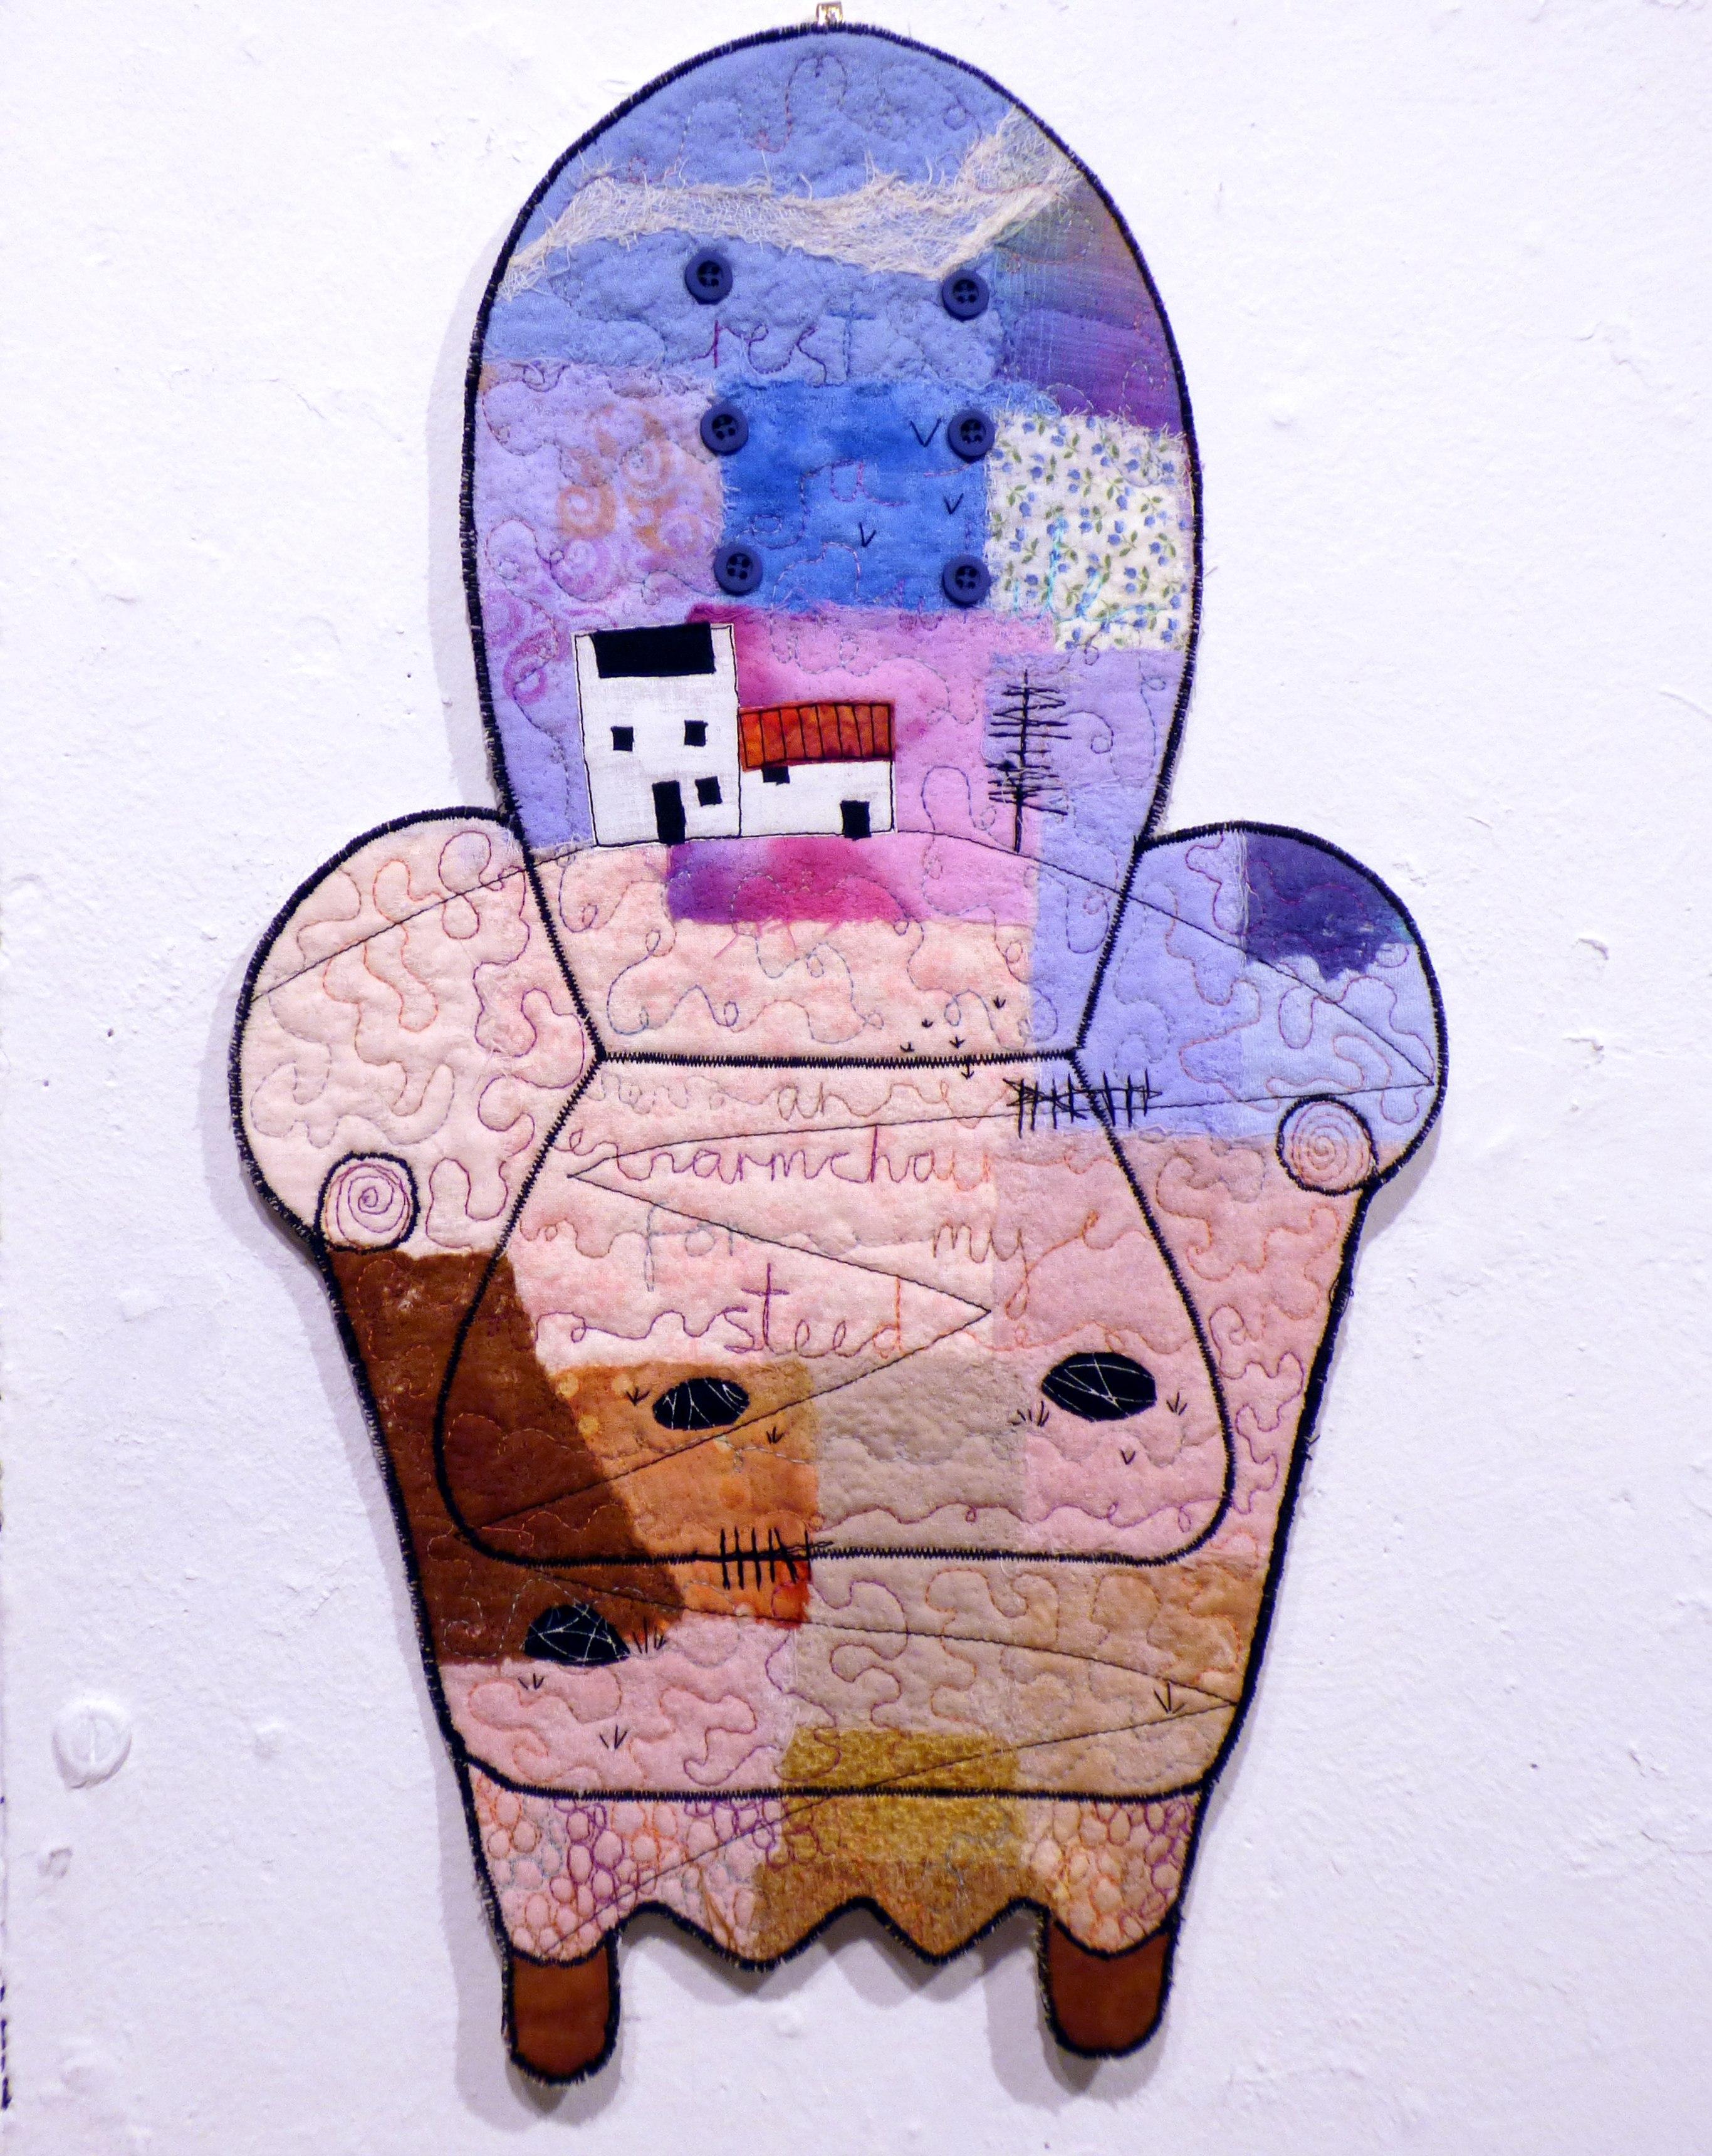 AN ARMCHAIR FOR MY STEAD by Michelle Barnard, Ten Plus exhibition, Nantwich